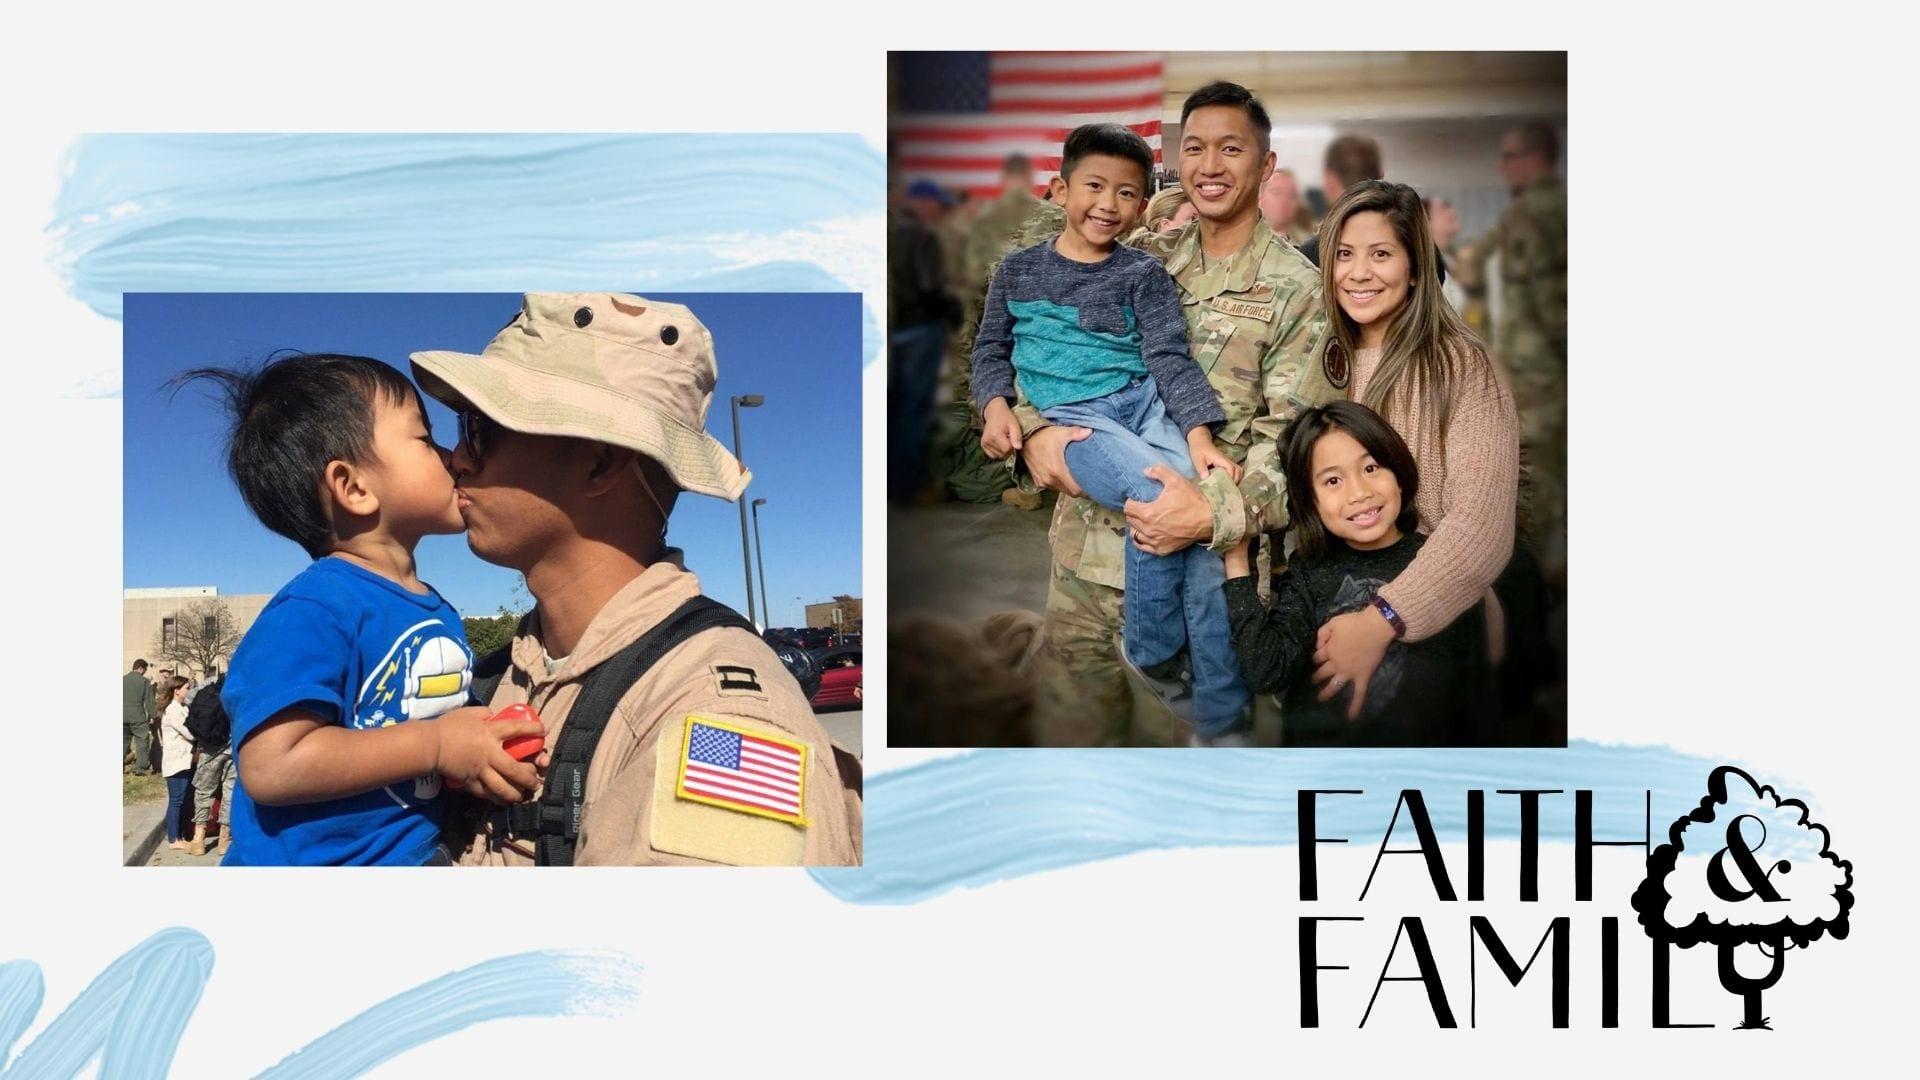 Montage of military family photos